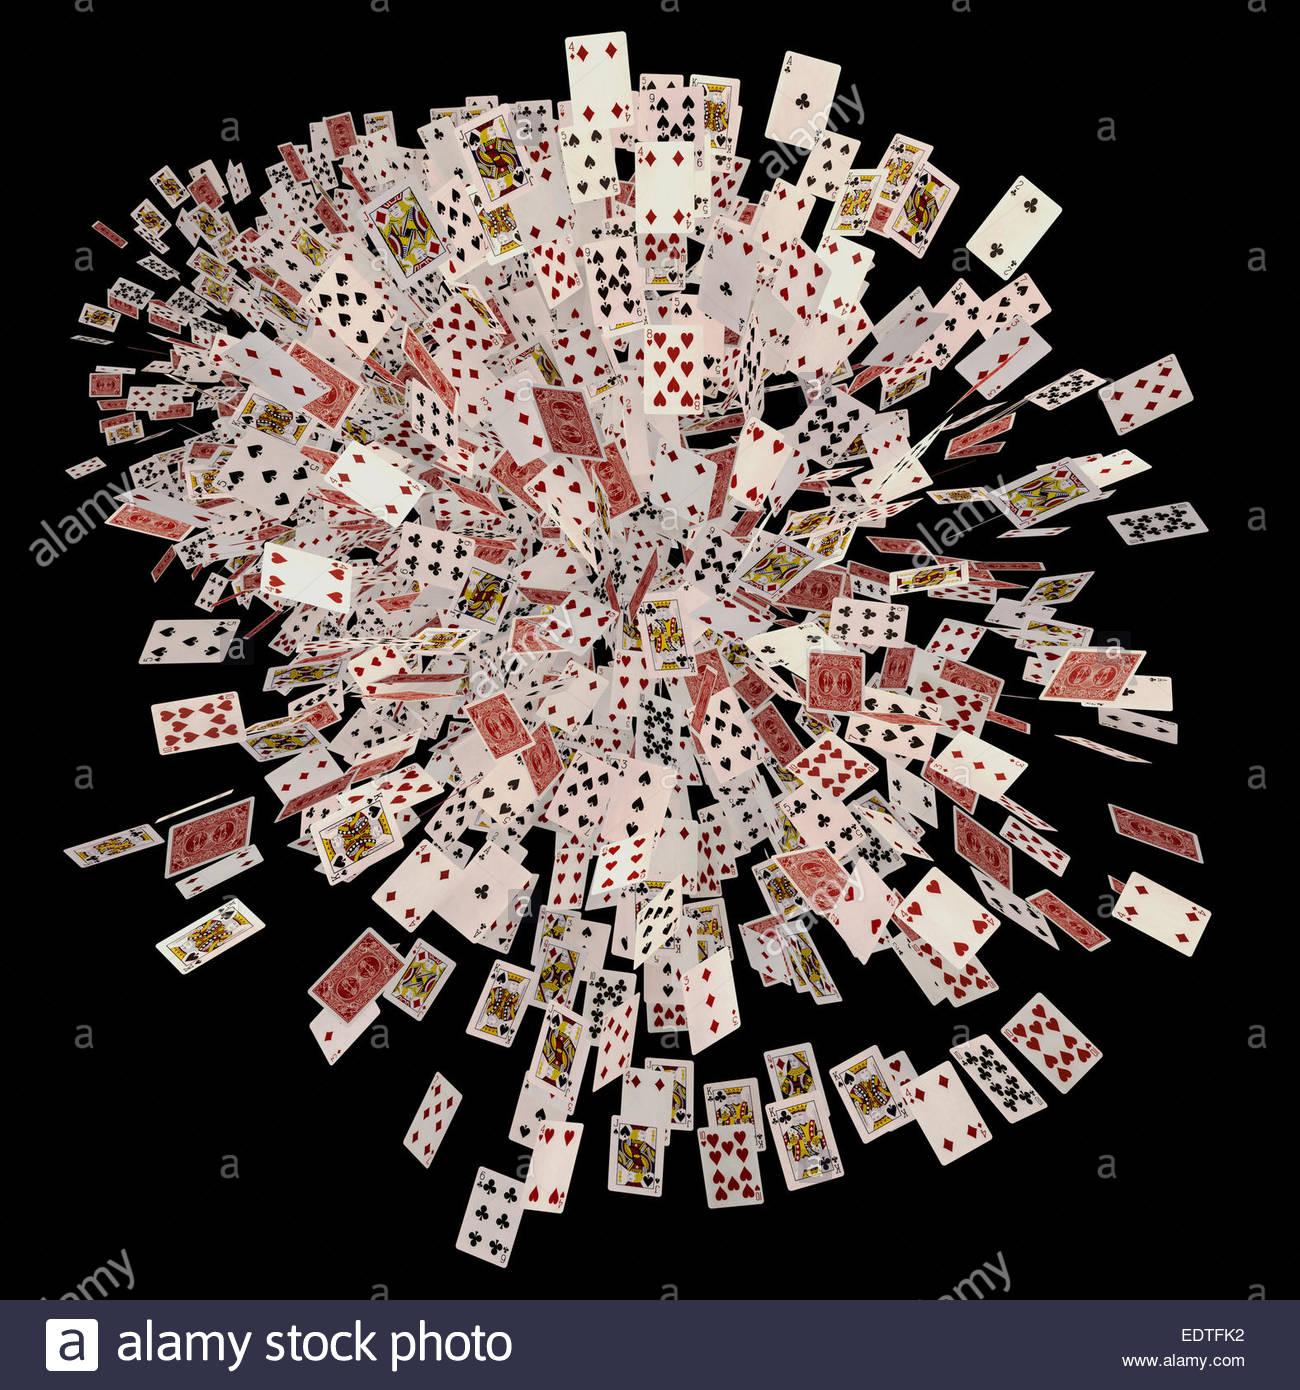 Card Bomb Generation